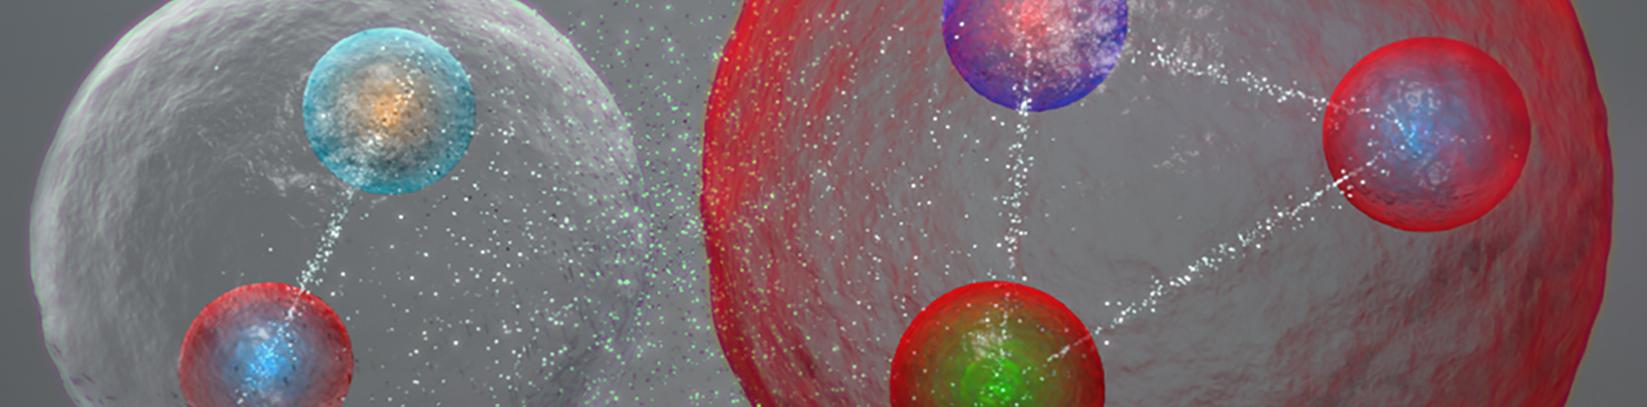 QCD, interacción fuerte, fuerza nuclear fuerte, pentaquark, quark, física hadrónica,